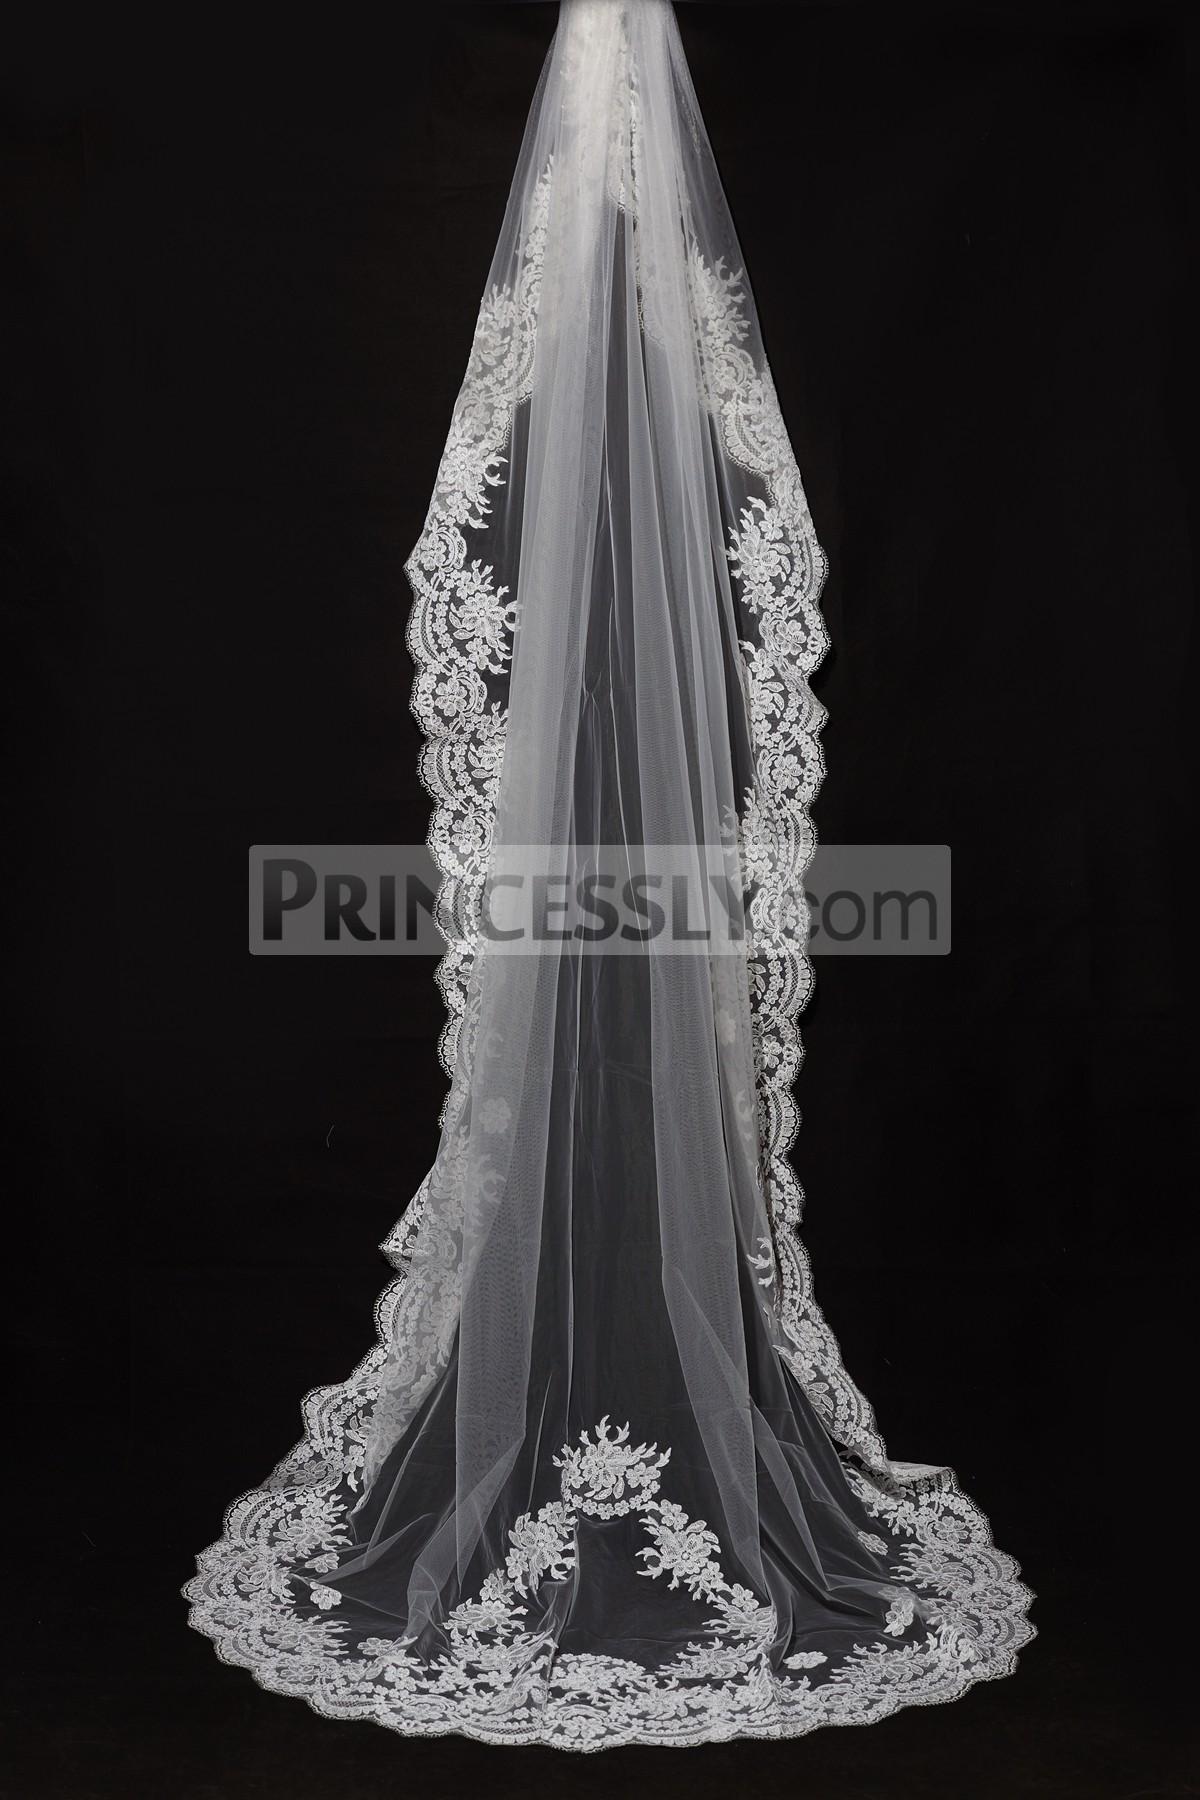 Princessly.com-K1000335-Cathedral Long Floor Length French Lace Trim Appliques Wedding Veil-31